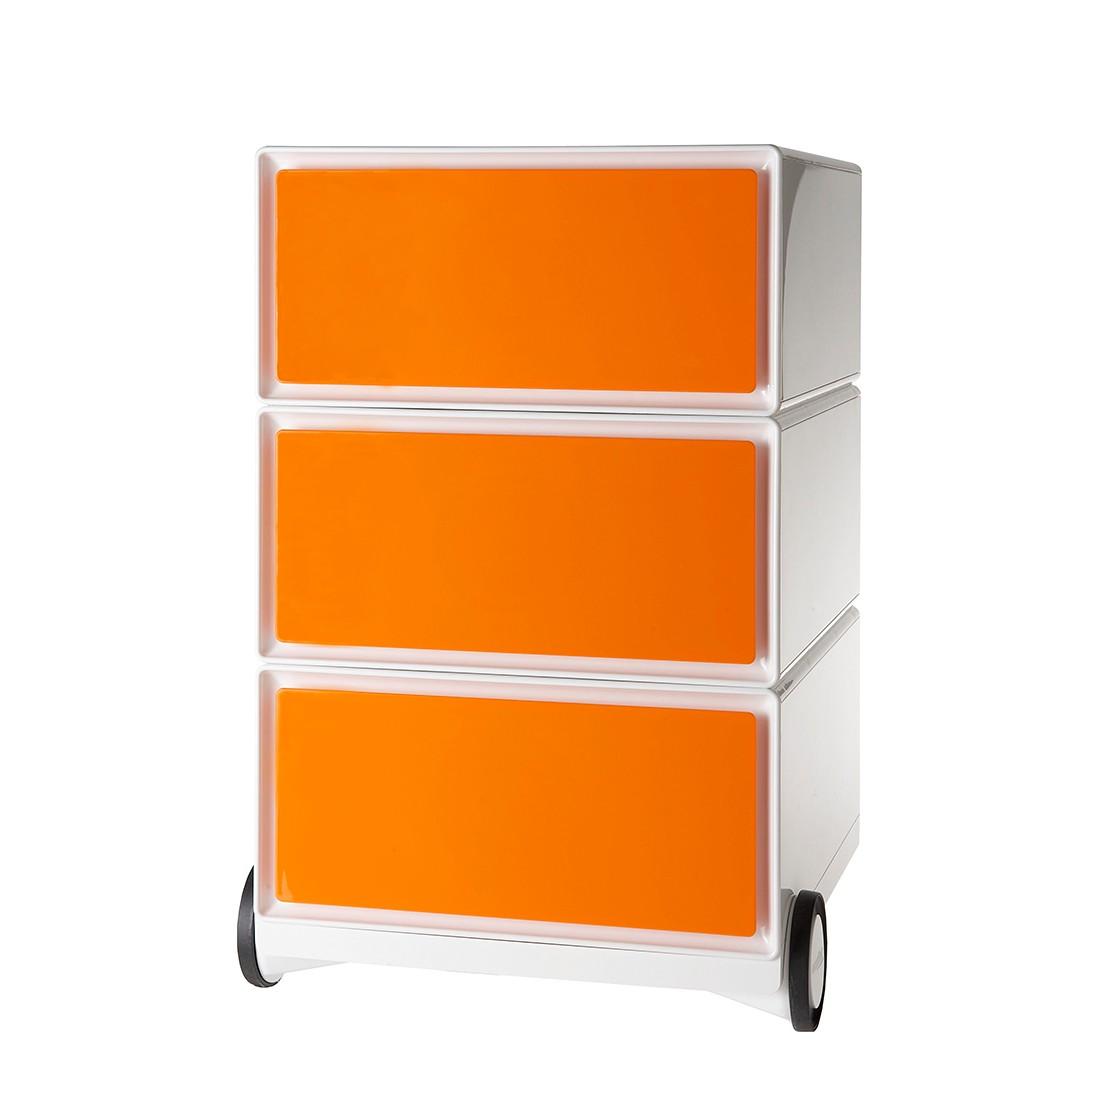 Rollende kast easyBox I - Wit/oranje, easy Office und Paperflow